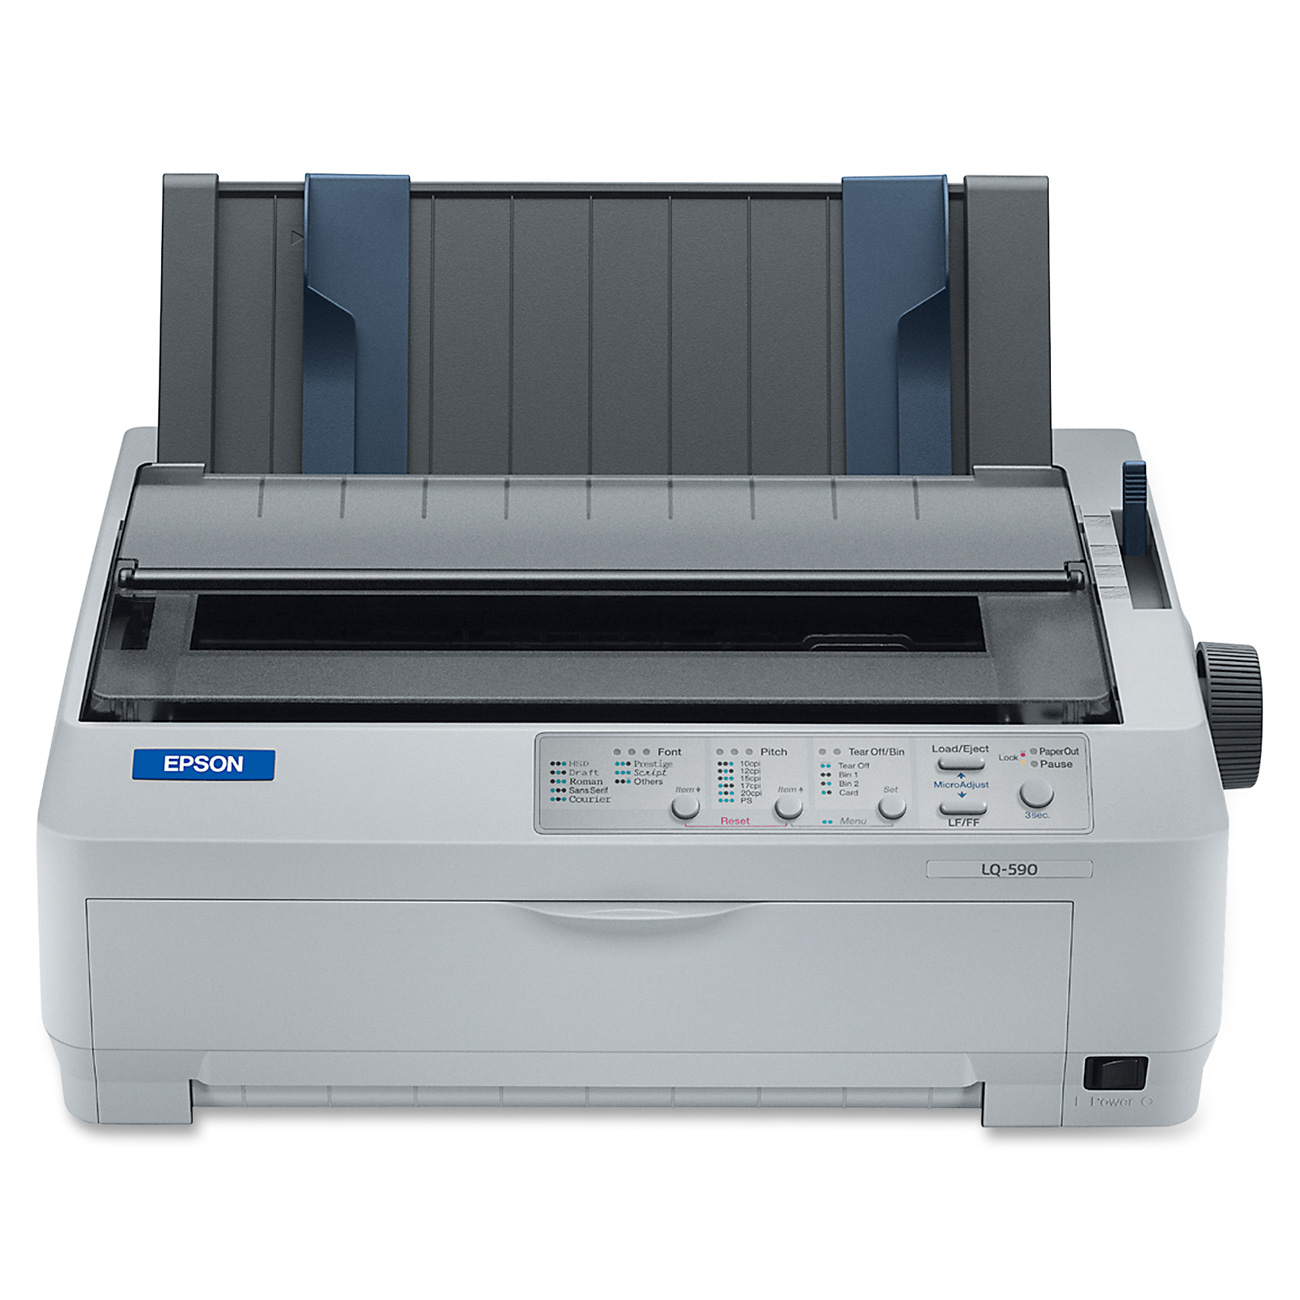 Daftar Harga Epson Lq 310 Dot Matrix Printer Termurah 2018 Lx 590 Epsc11c558001